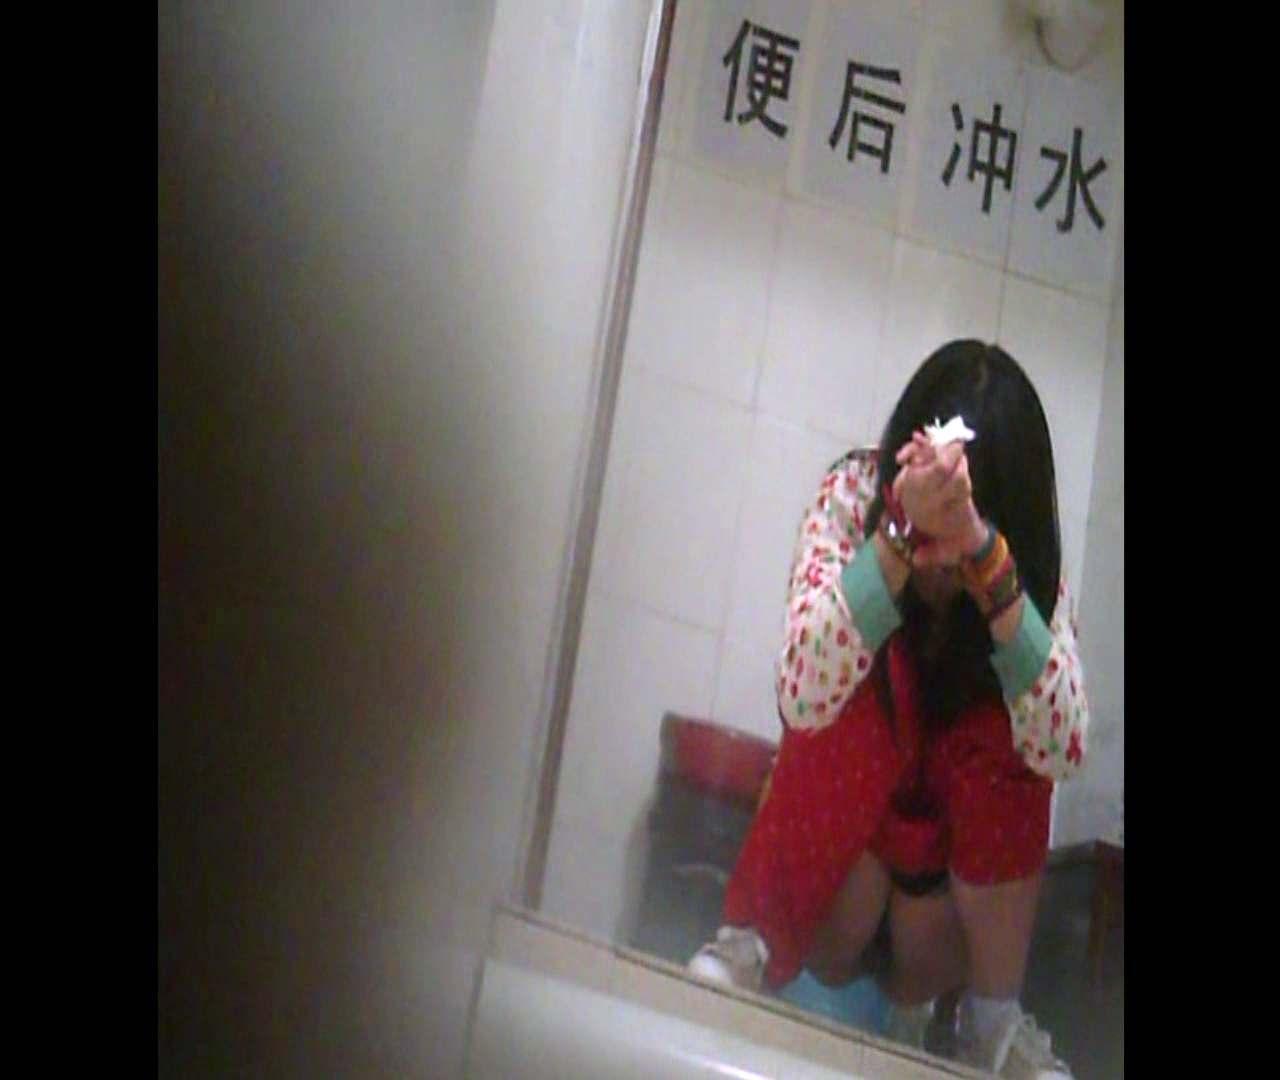 Vol.01 赤のパンツスタイルがとっても眩しい!! パンツ特集 AV無料動画キャプチャ 61画像 50